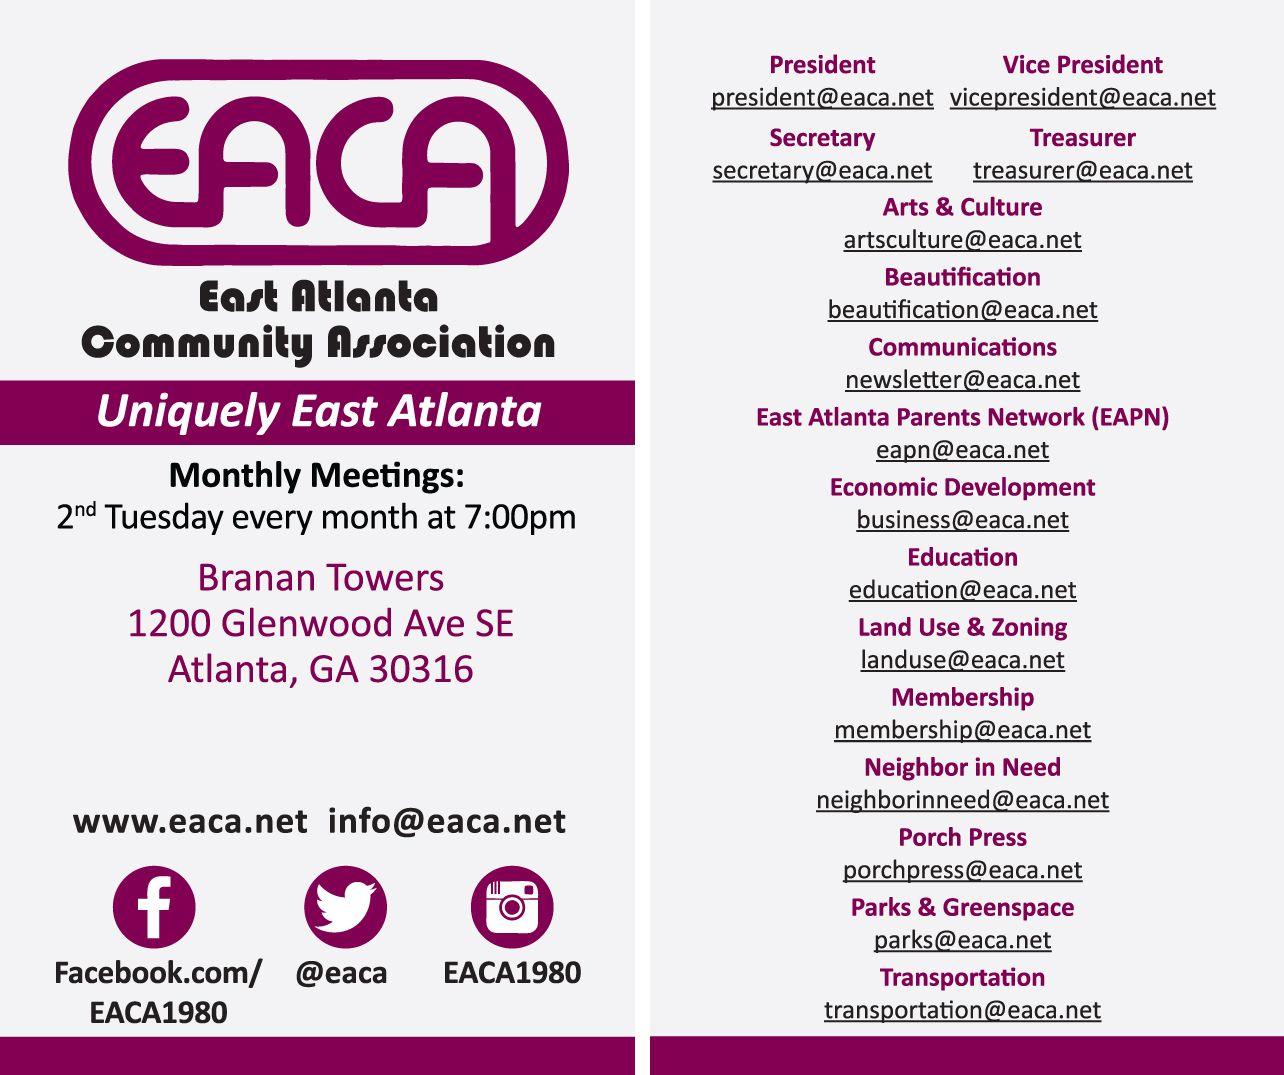 Business card designed for the East Atlanta Community Association ...